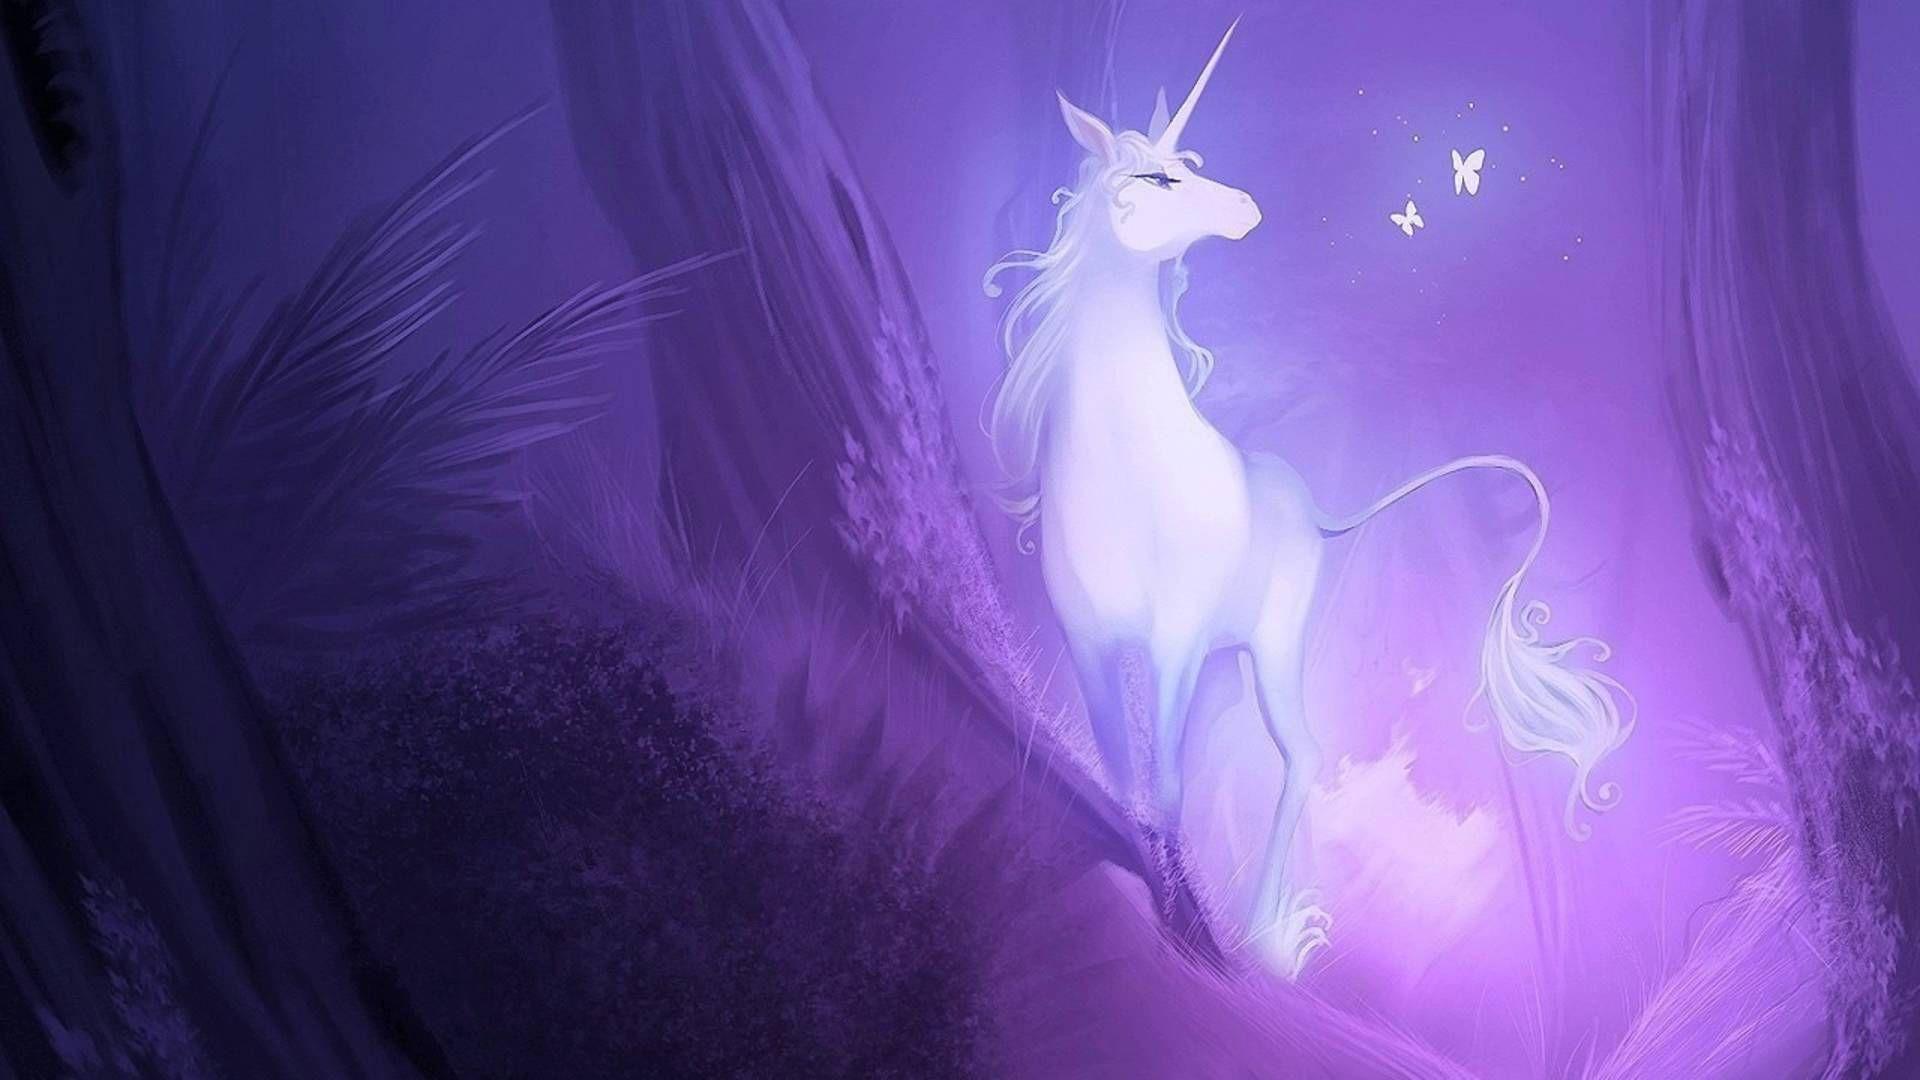 Unicorn full screen hd wallpaper